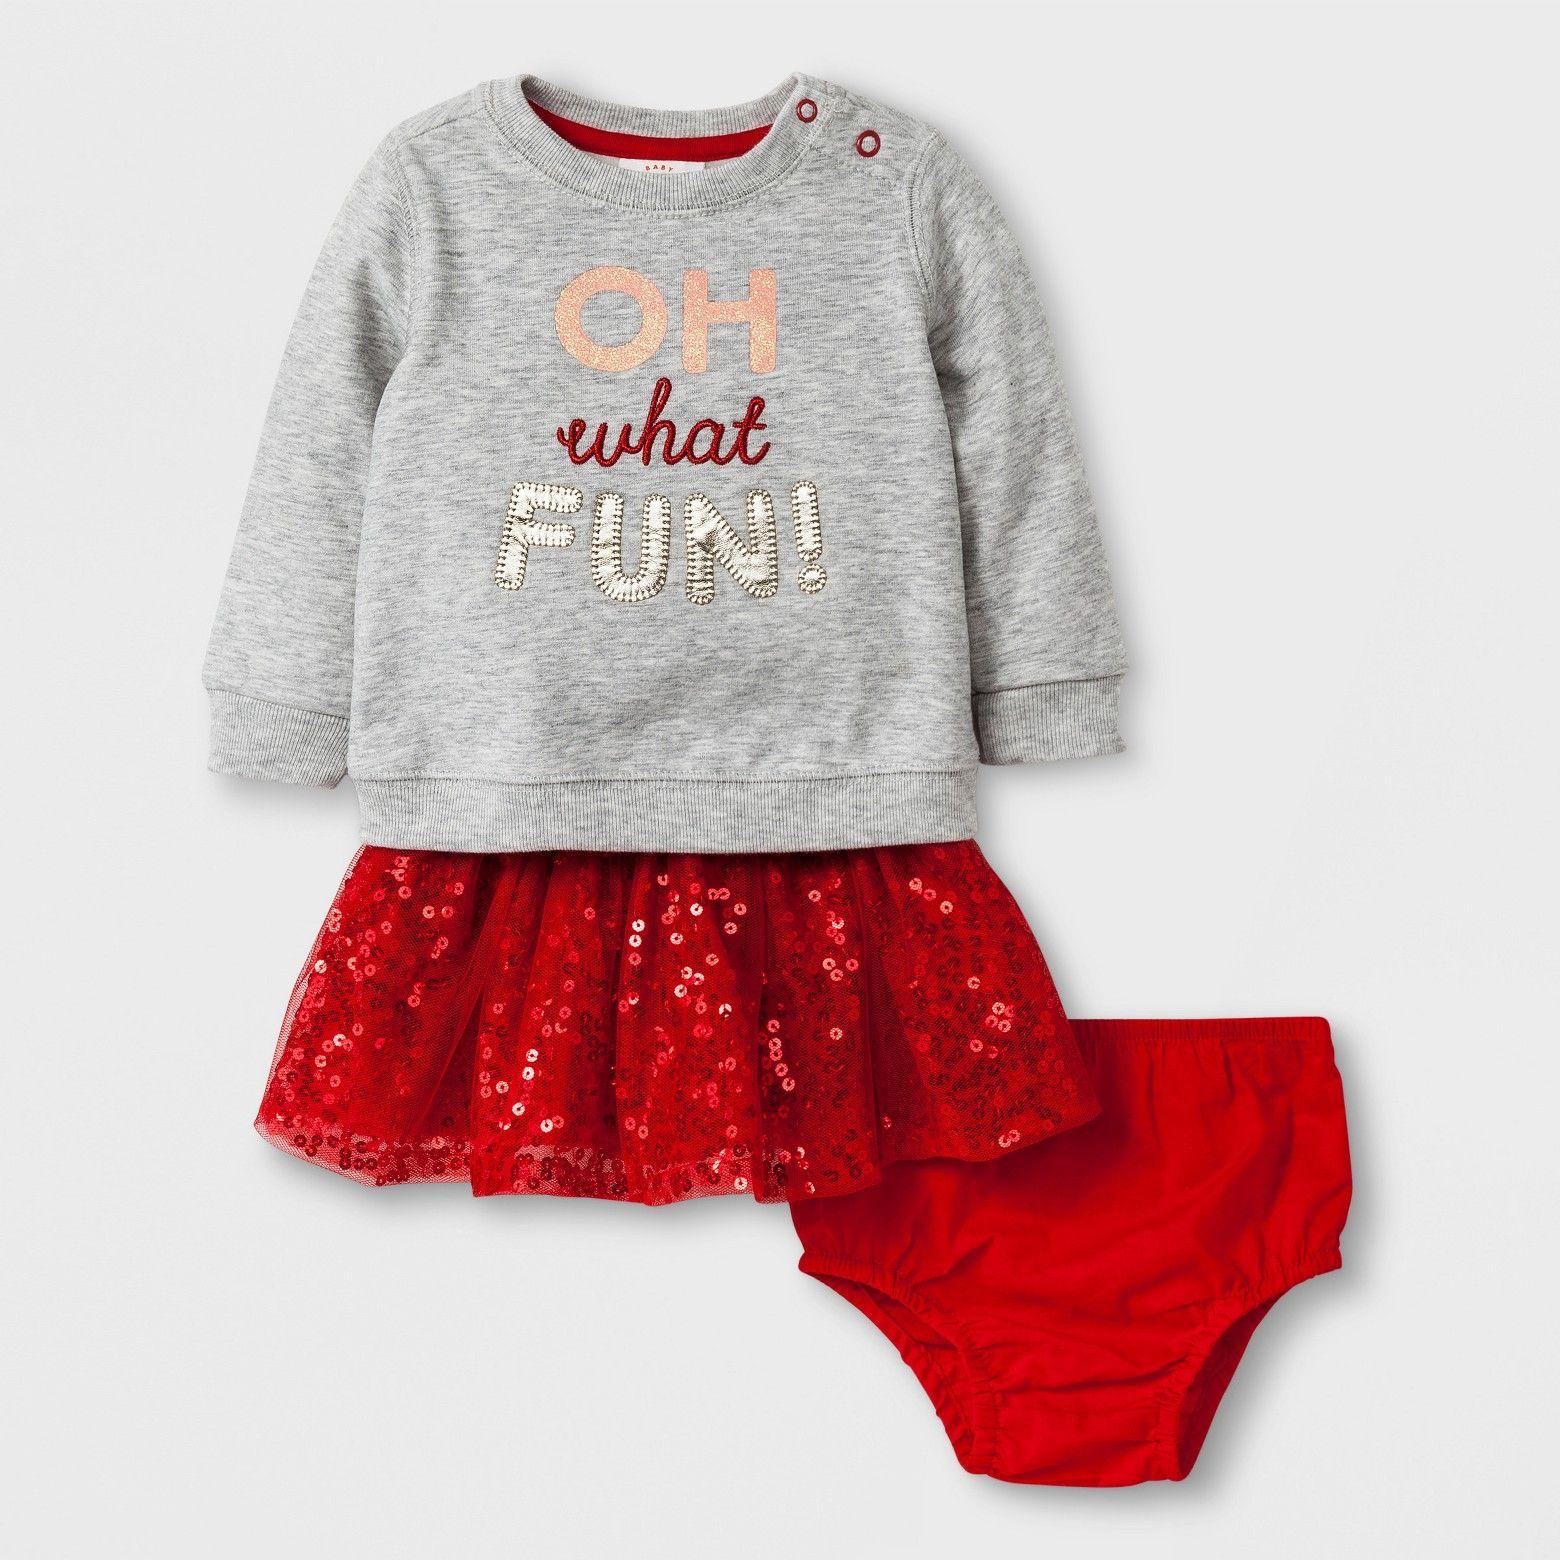 240d1d76e0de W17 | Holiday Sweatshirt w/ Sequin Skirt | Cat & Jack | $15.99 | Cat ...